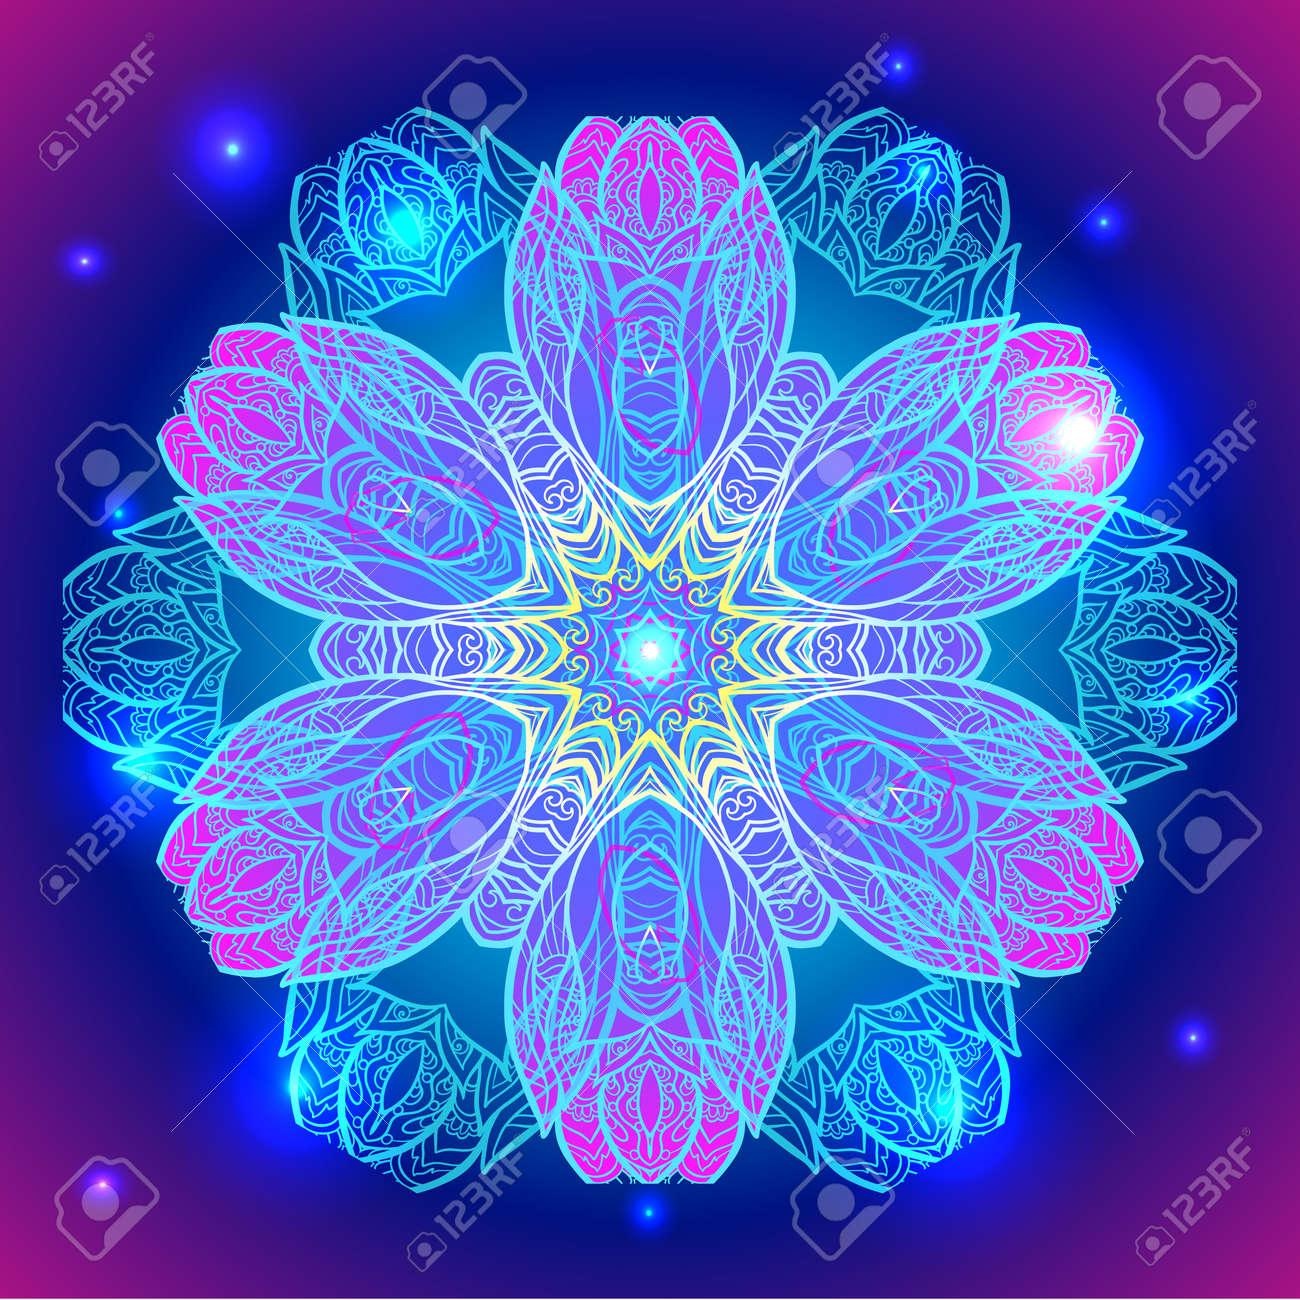 mandala sacred geometry symbol in neon colors royalty free cliparts